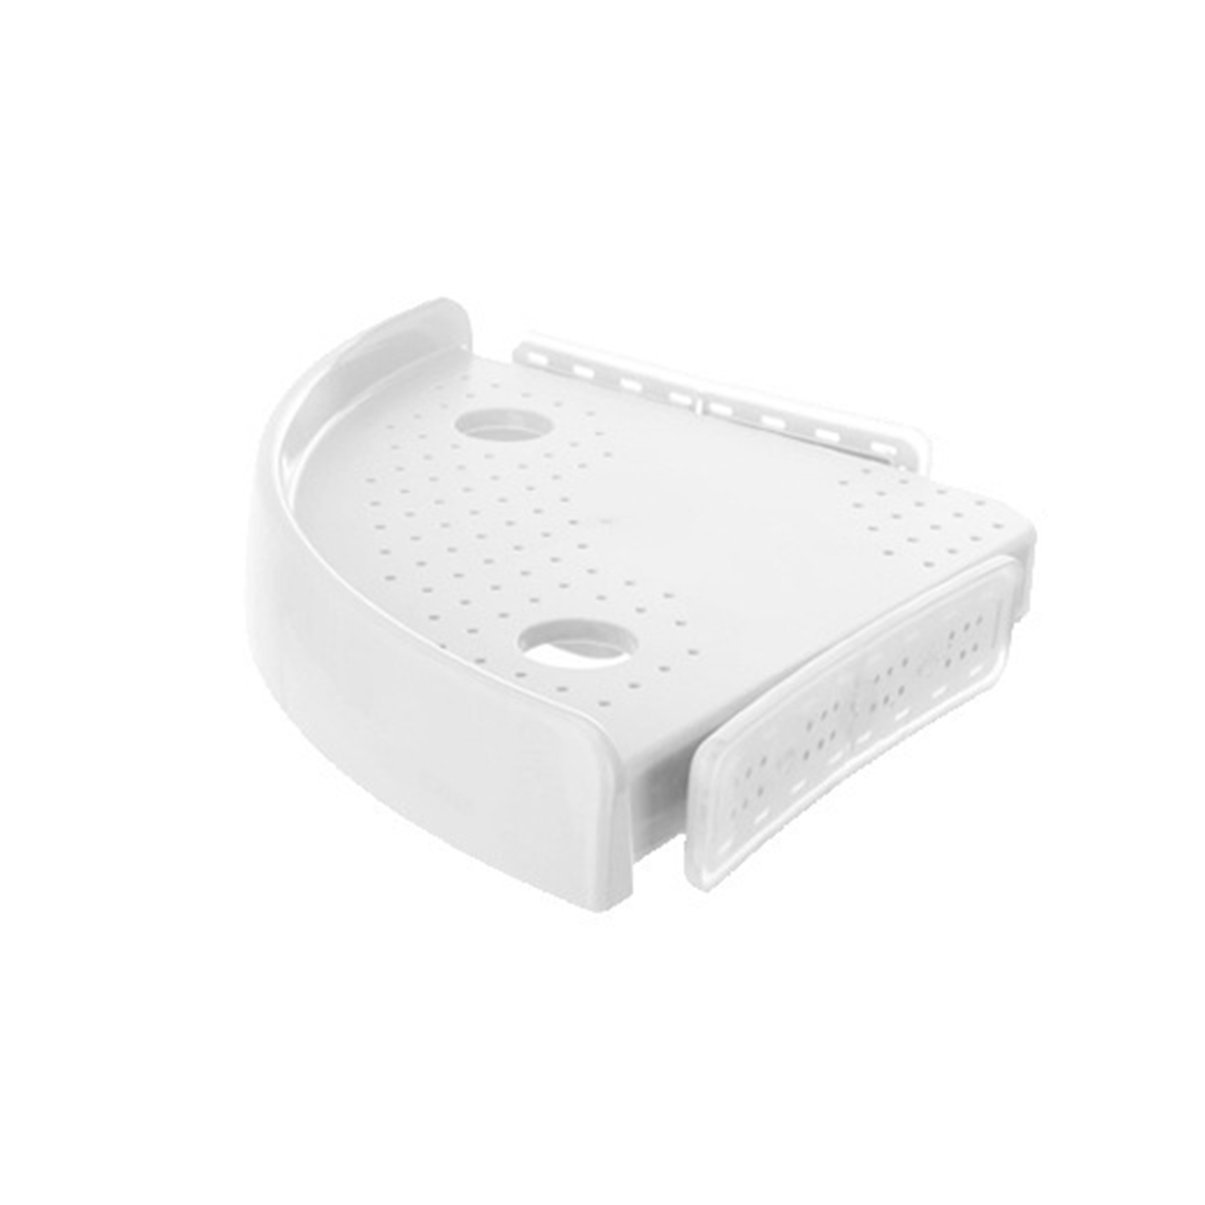 Jullyelegant Corner Shelf, Unit Shelves Kit, Non-marking Triangle Bathroom Snap Storage Rack With Hooks